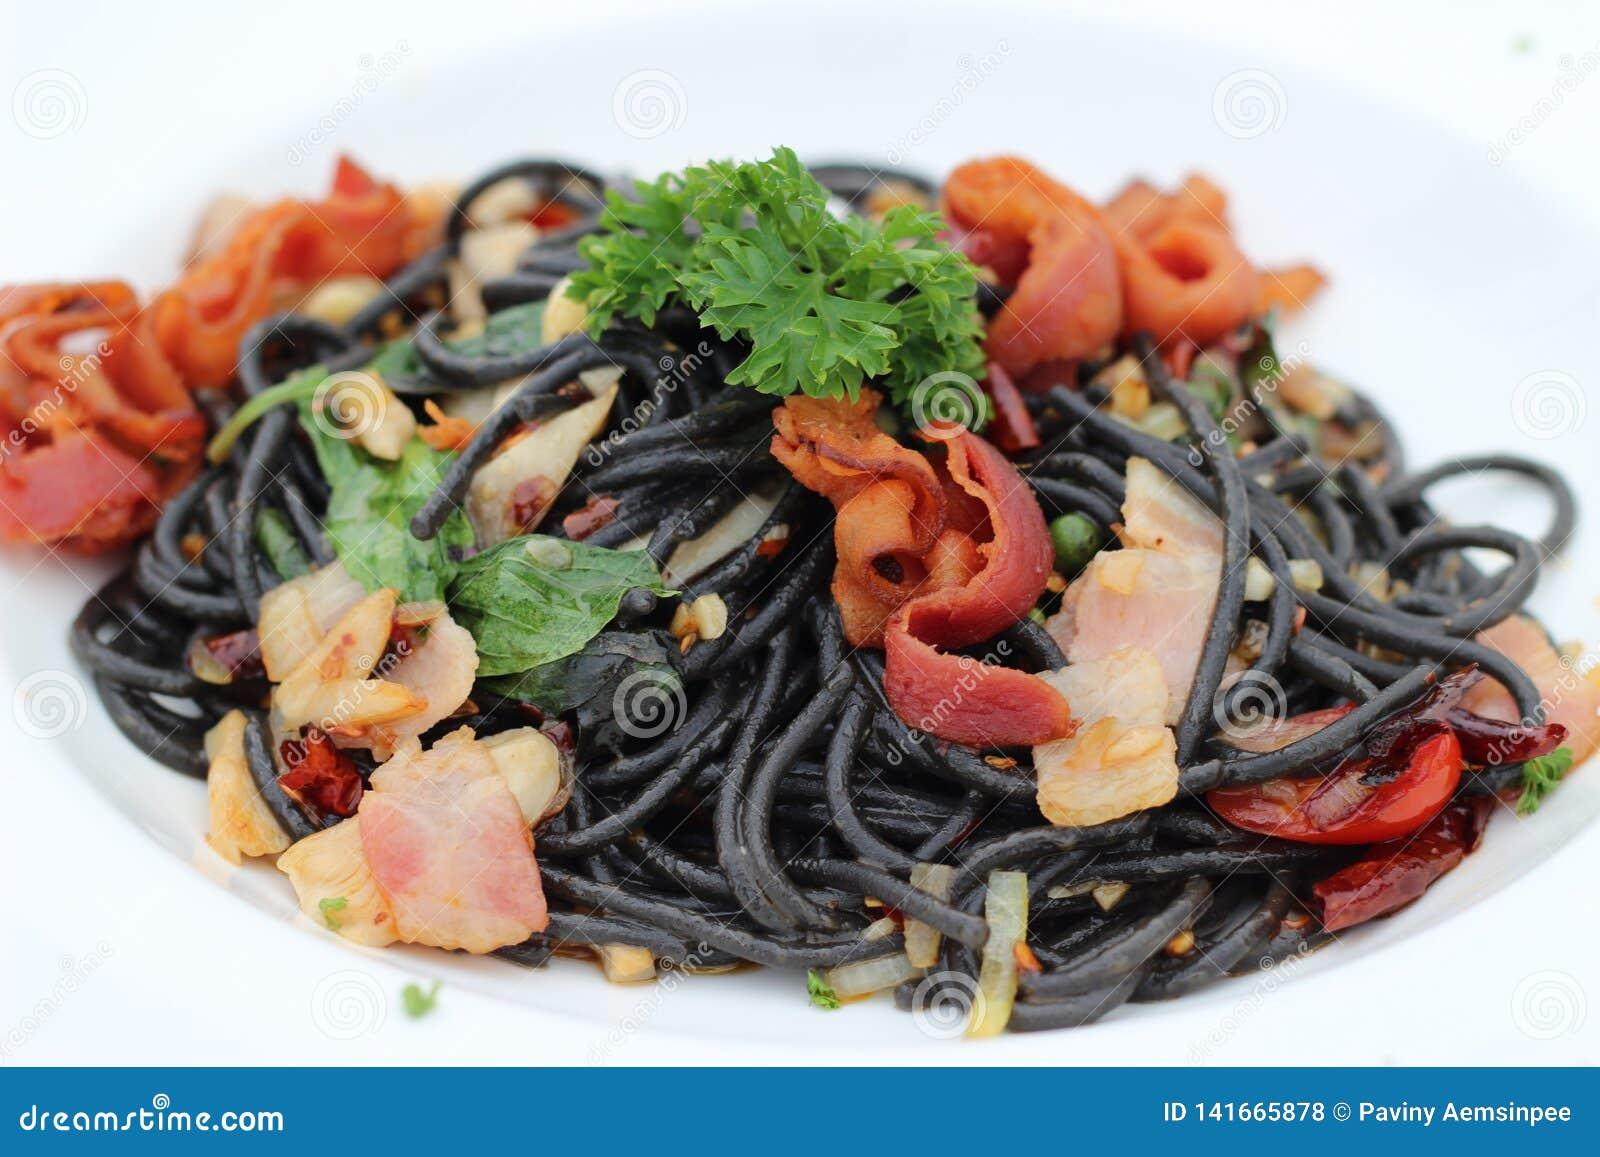 Spaghetti, pâtes, nourriture, Asiatique, Thaïlande, Bangkok